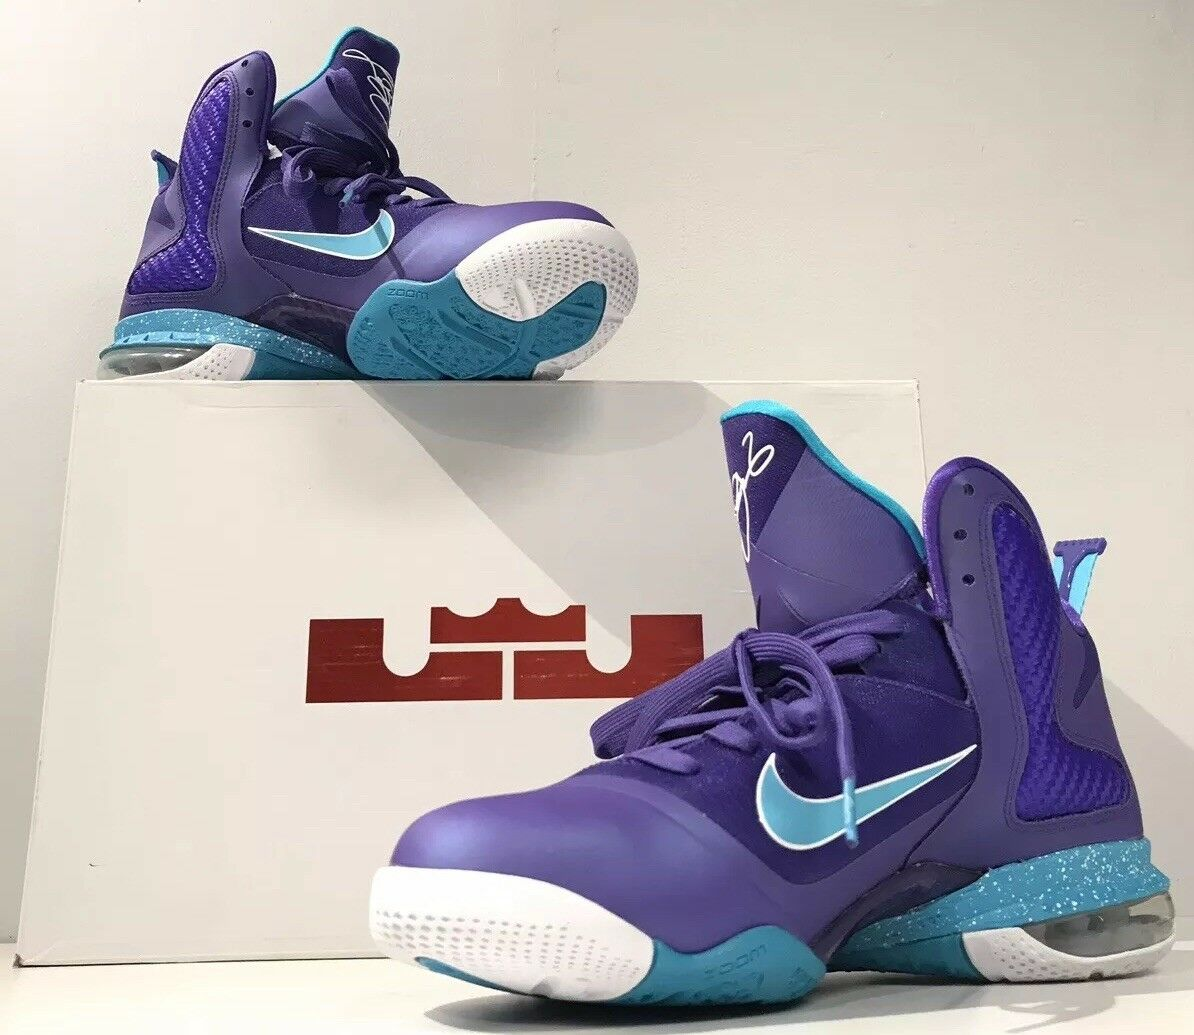 hot sale online f6ea9 f1966 Nike LeBron 9  Summit Lake Hornets  Basketball shoes shoes shoes Sneakers -  Size 8.5